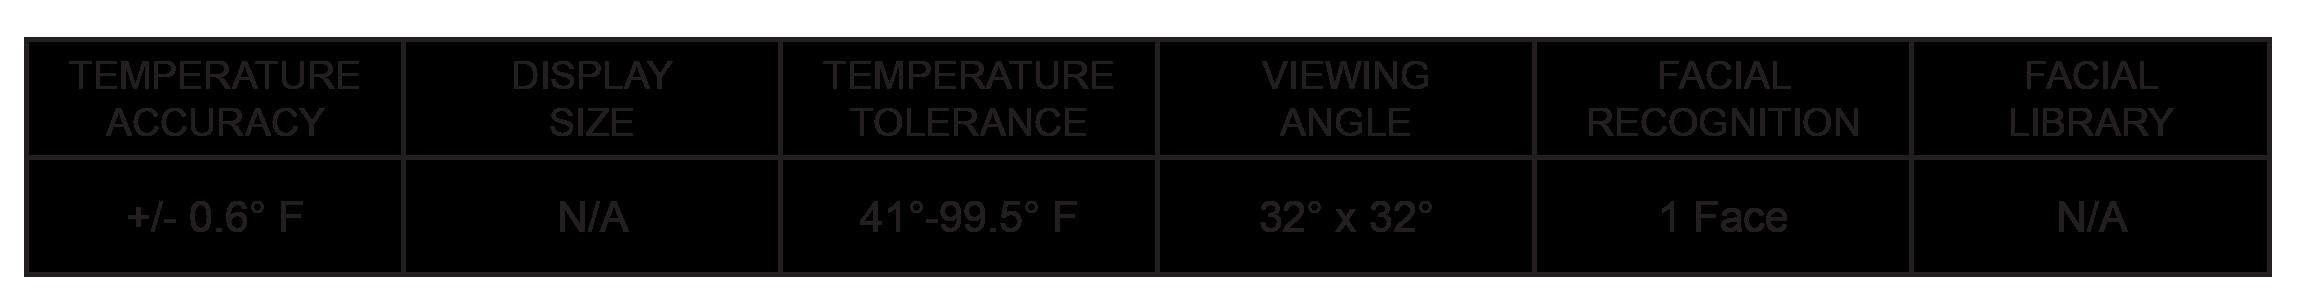 Cenntech Fever Detecting Smart Camera_table